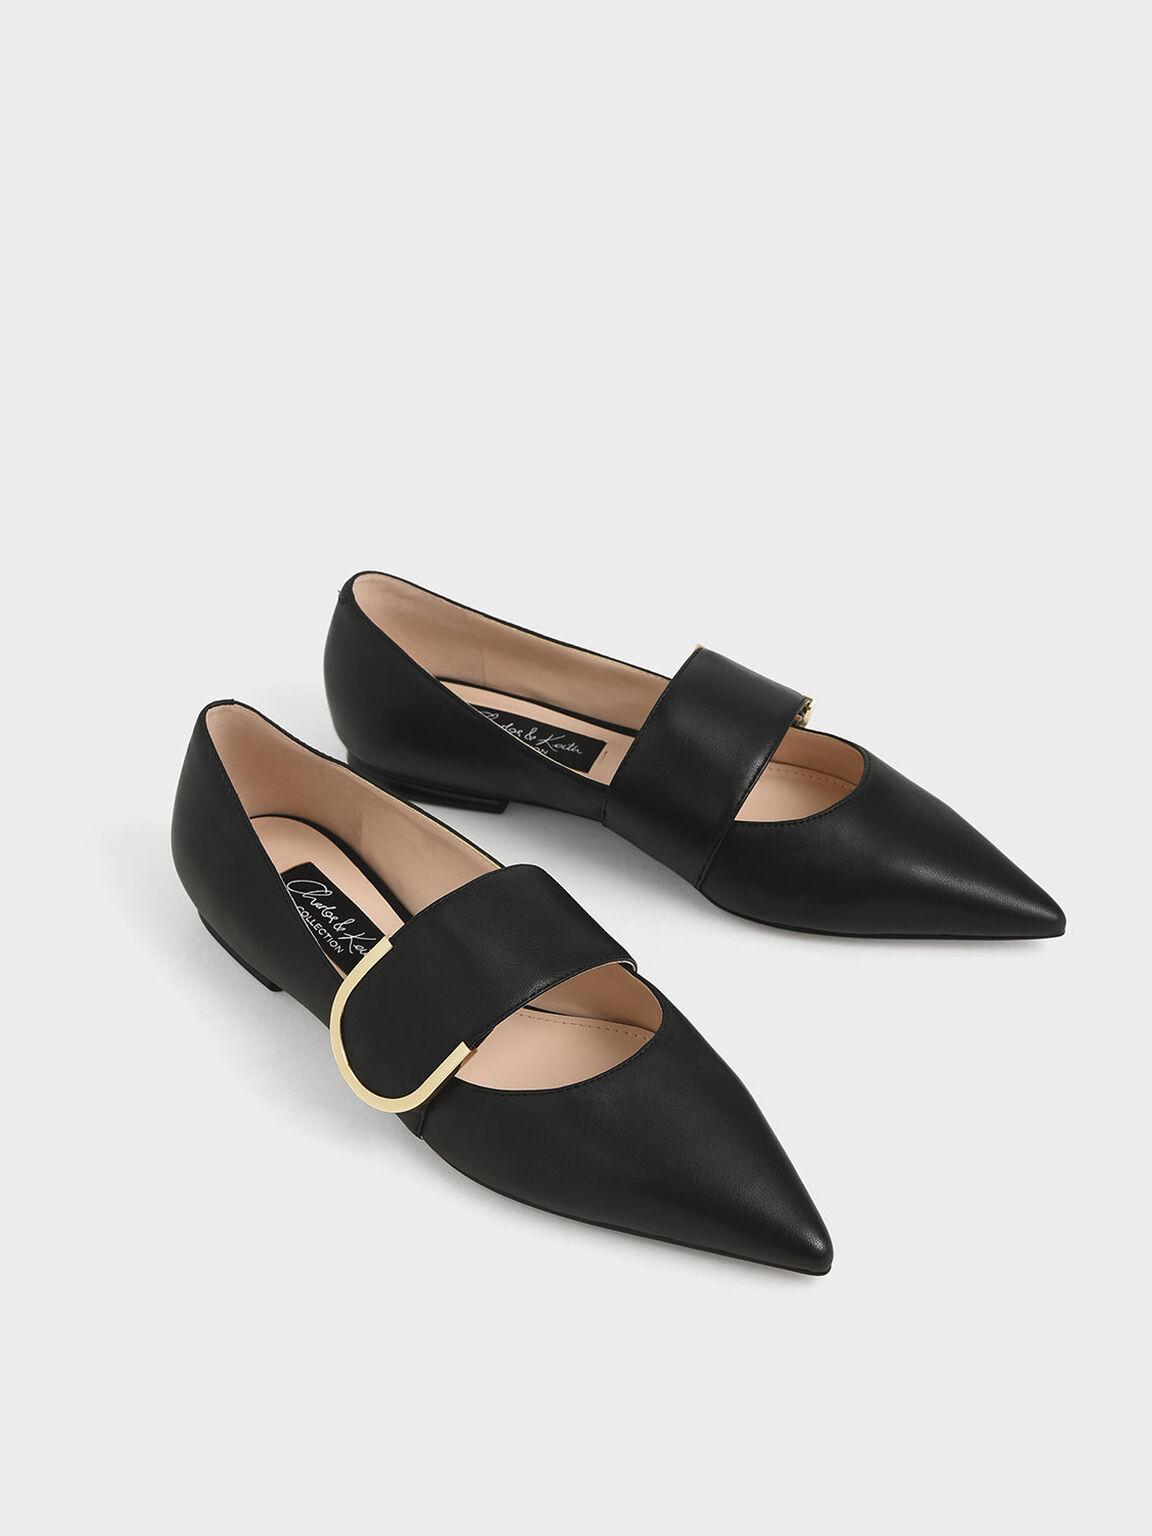 Leather Mary Jane Flats, Black, hi-res